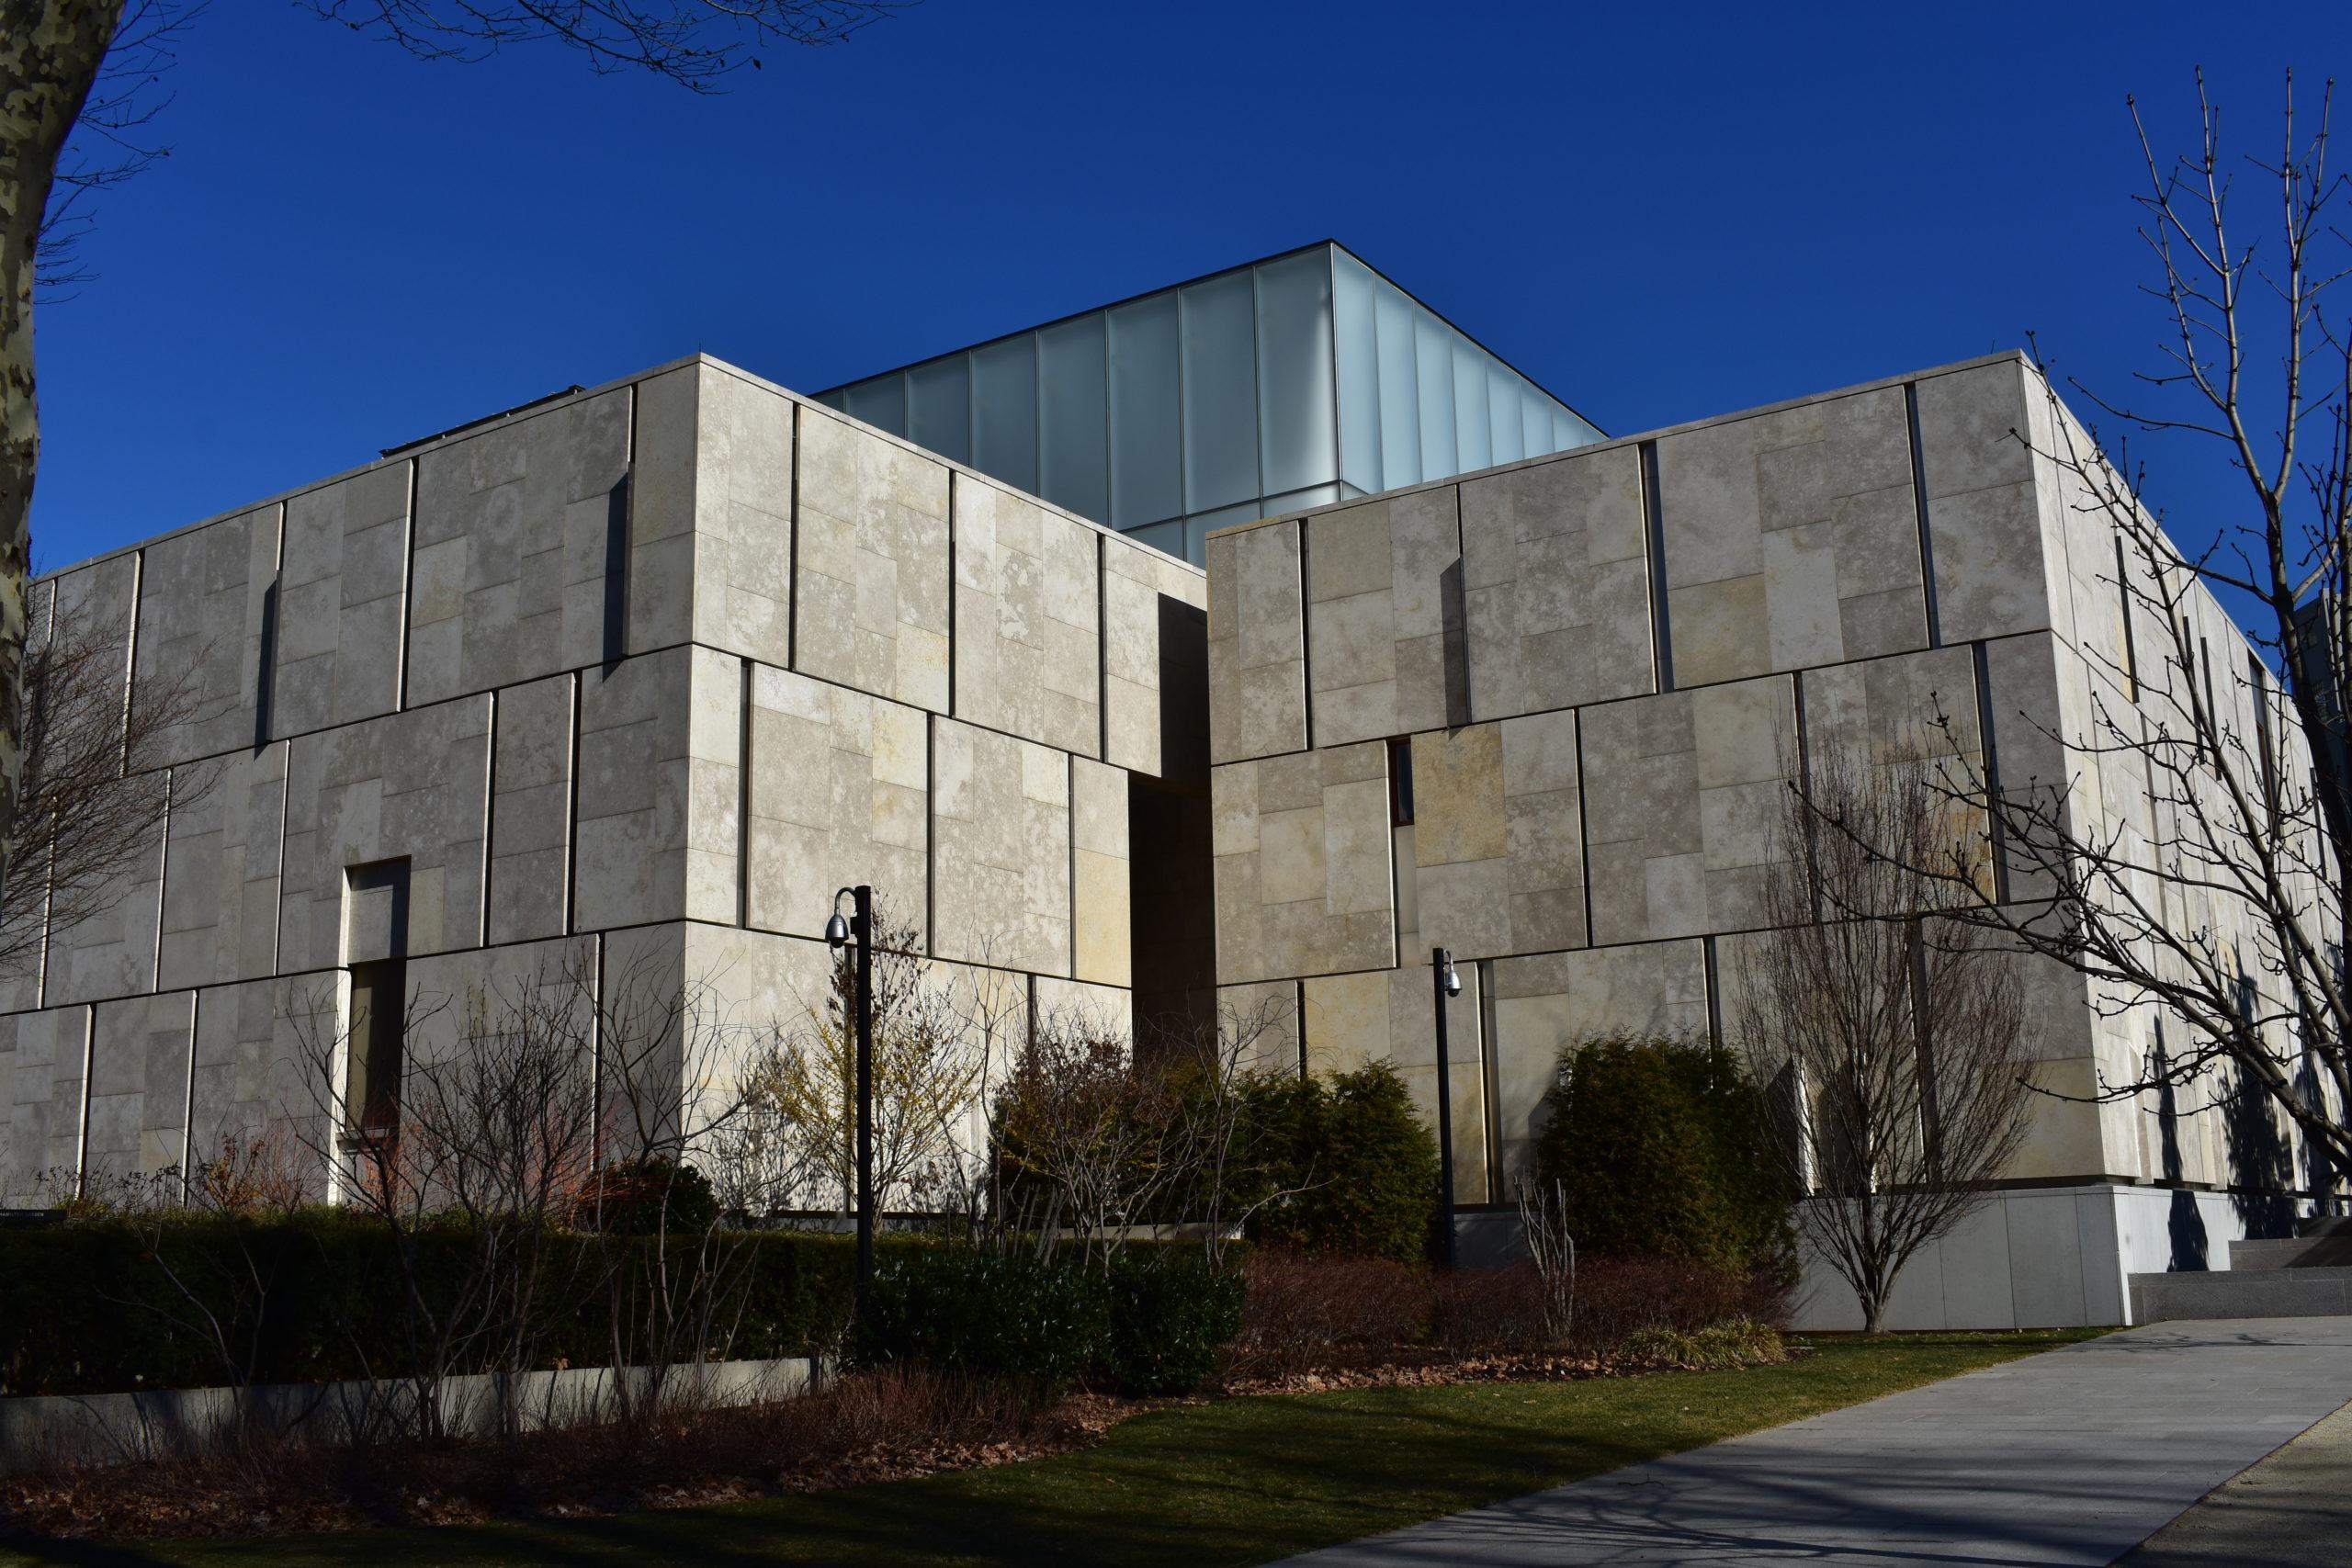 The Barnes Museum